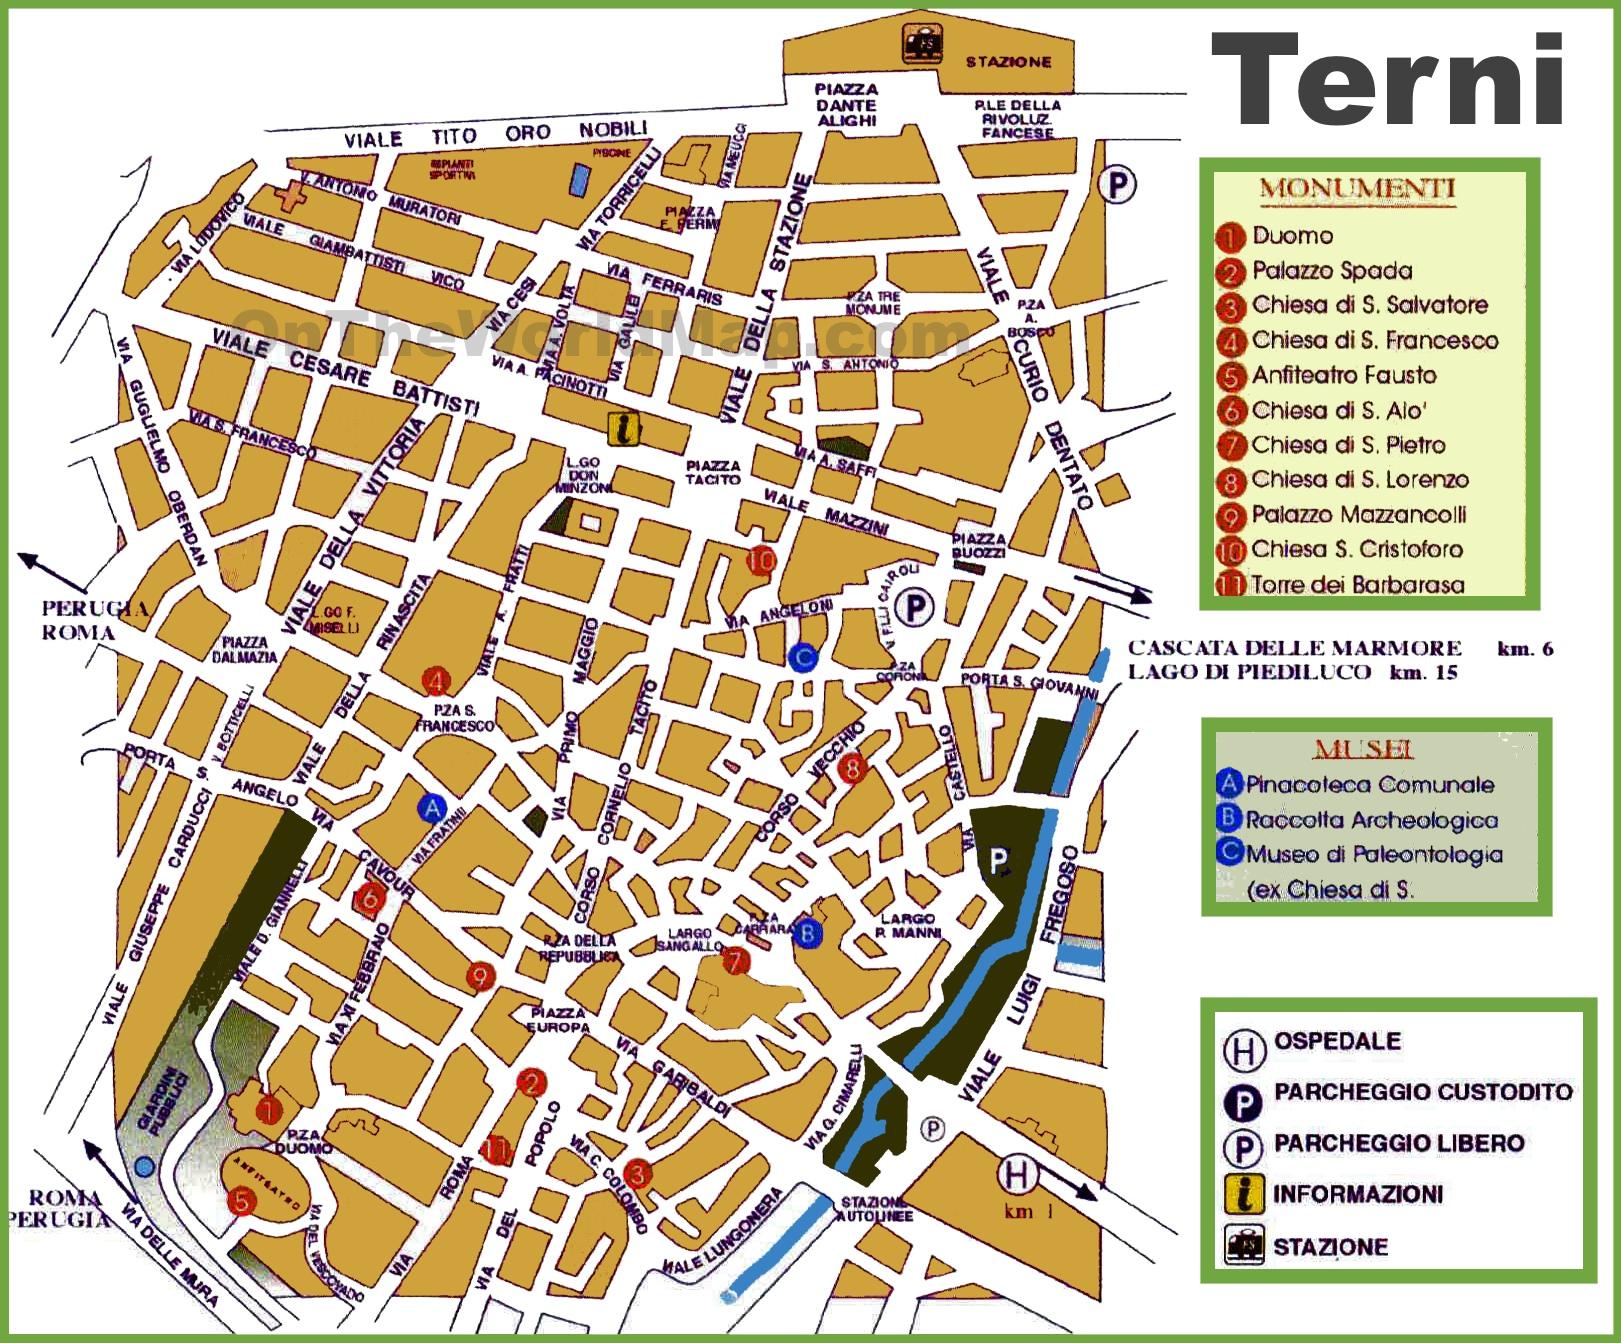 Terni tourist map